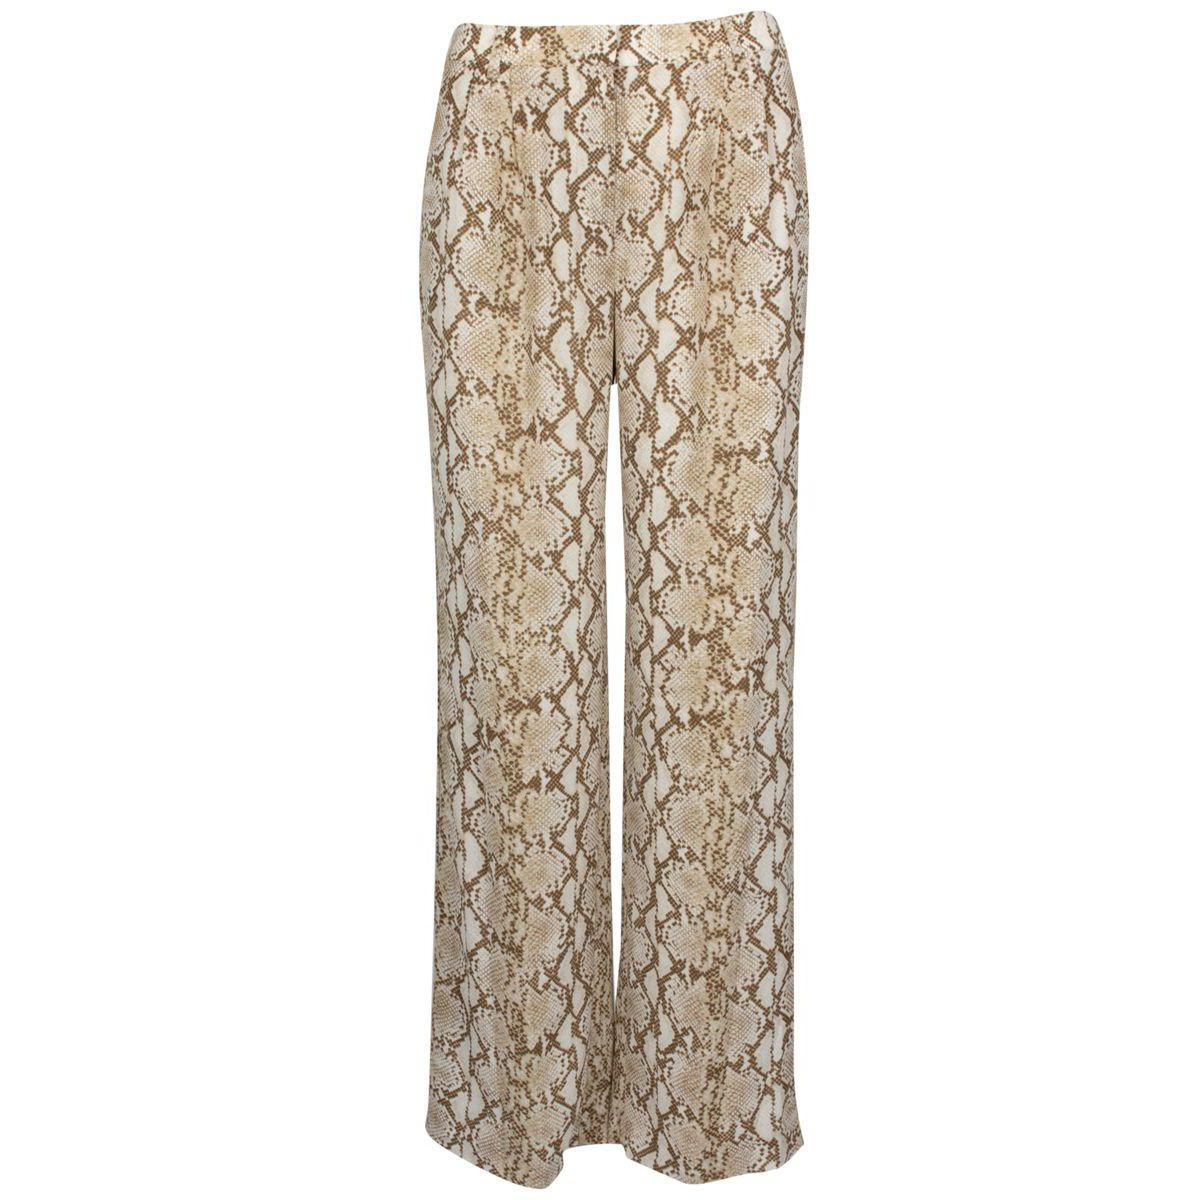 Wide viscose trousers with python print Khaki Michael Kors